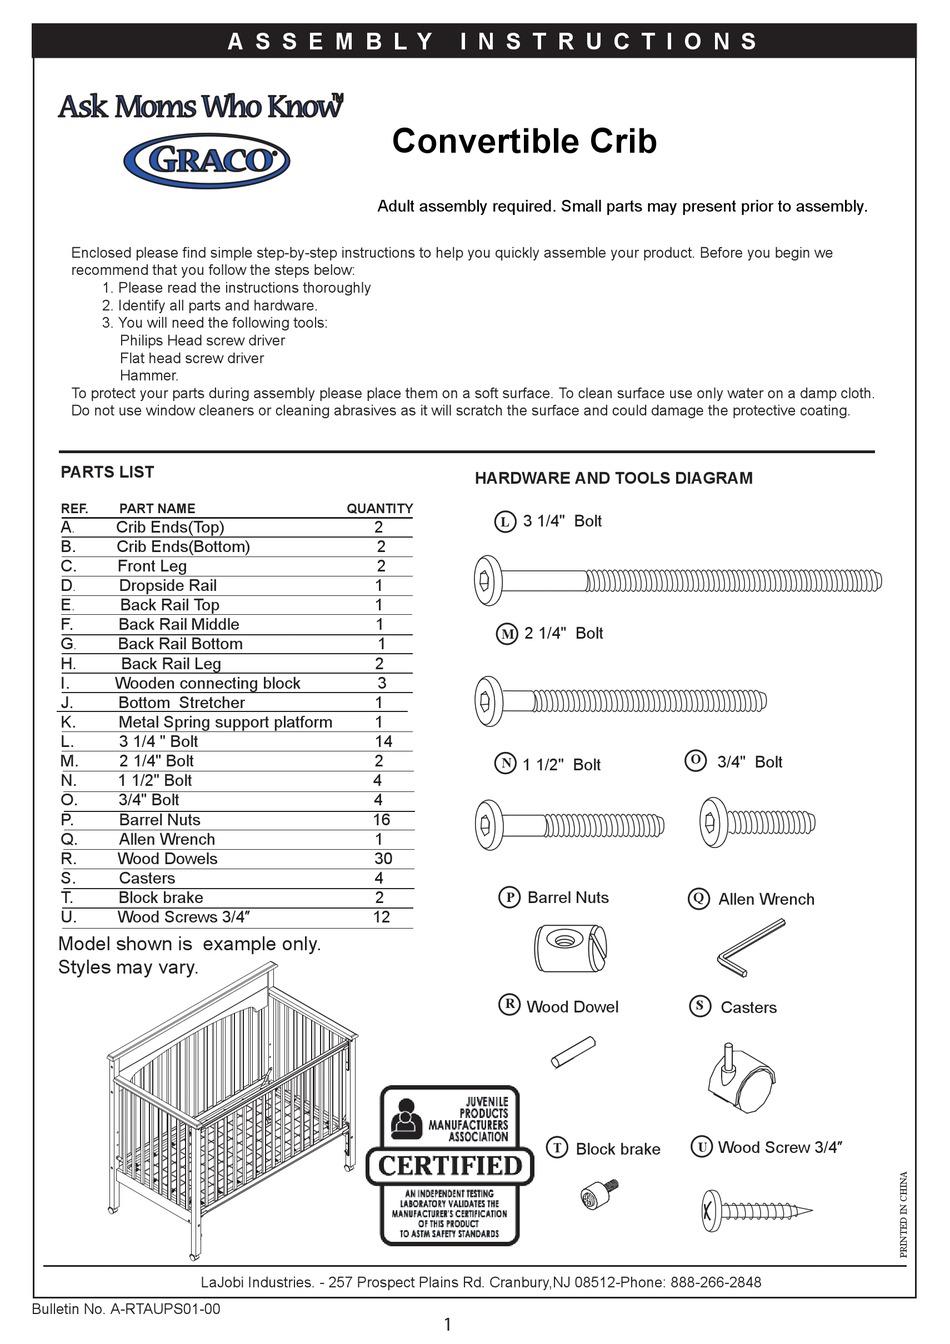 Graco 3250281 Lauren Drop Side Convertible Crib Assembly Instructions Manual Pdf Download Manualslib